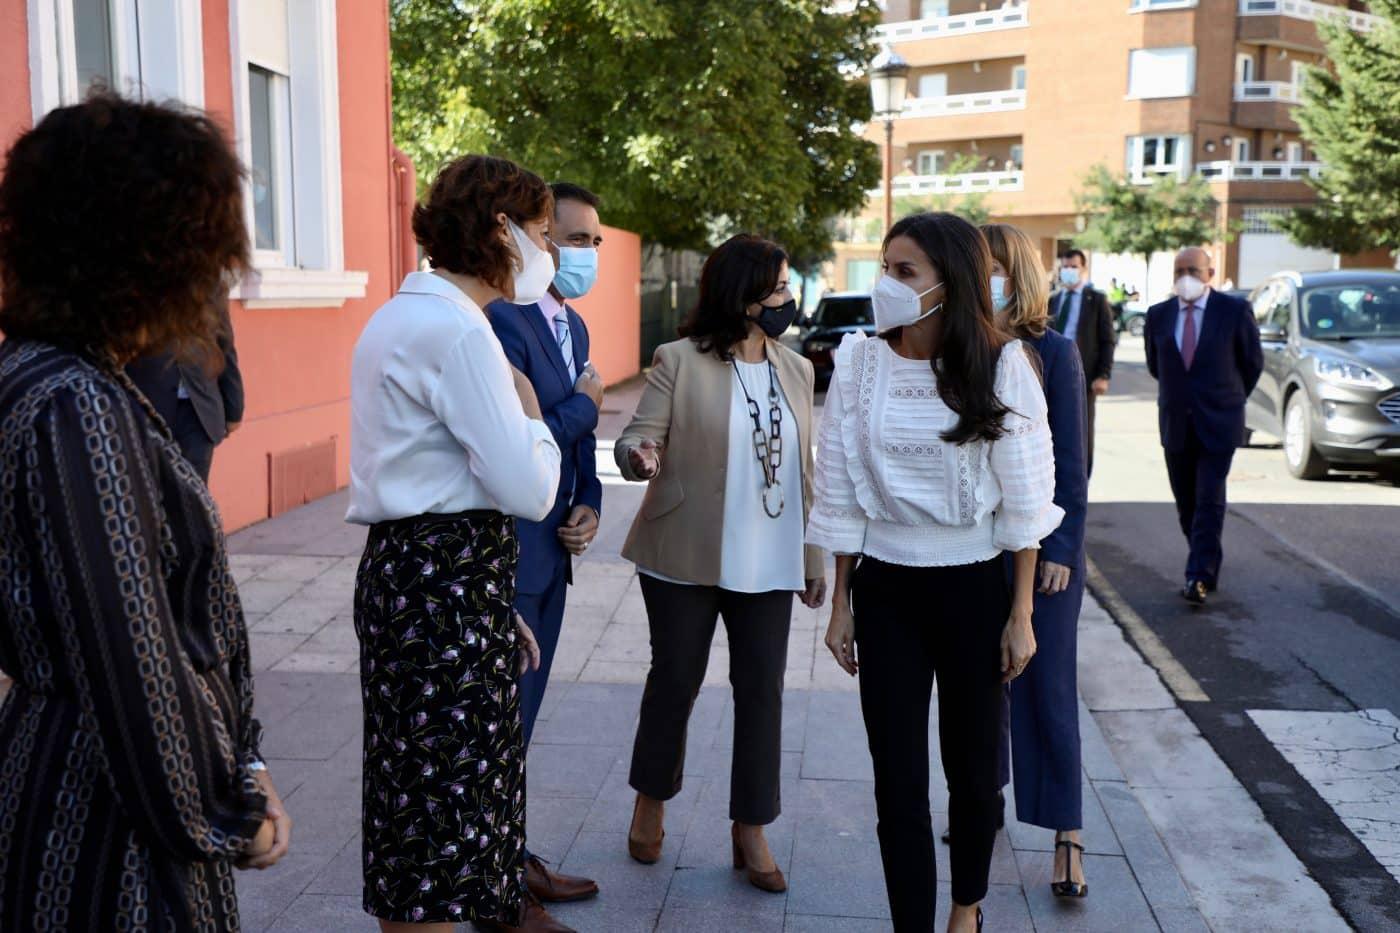 La reina Letizia preside en Haro la apertura del curso de FP 10